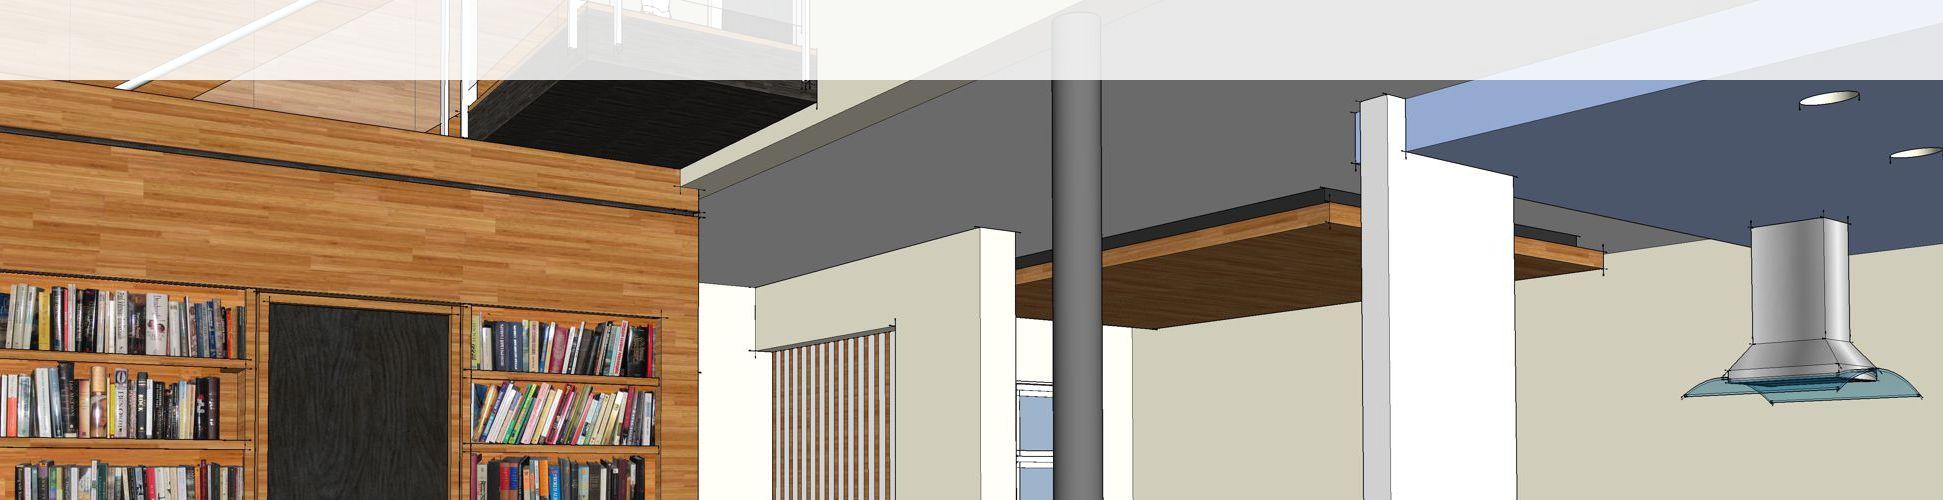 Methods - JT Architecture, TN